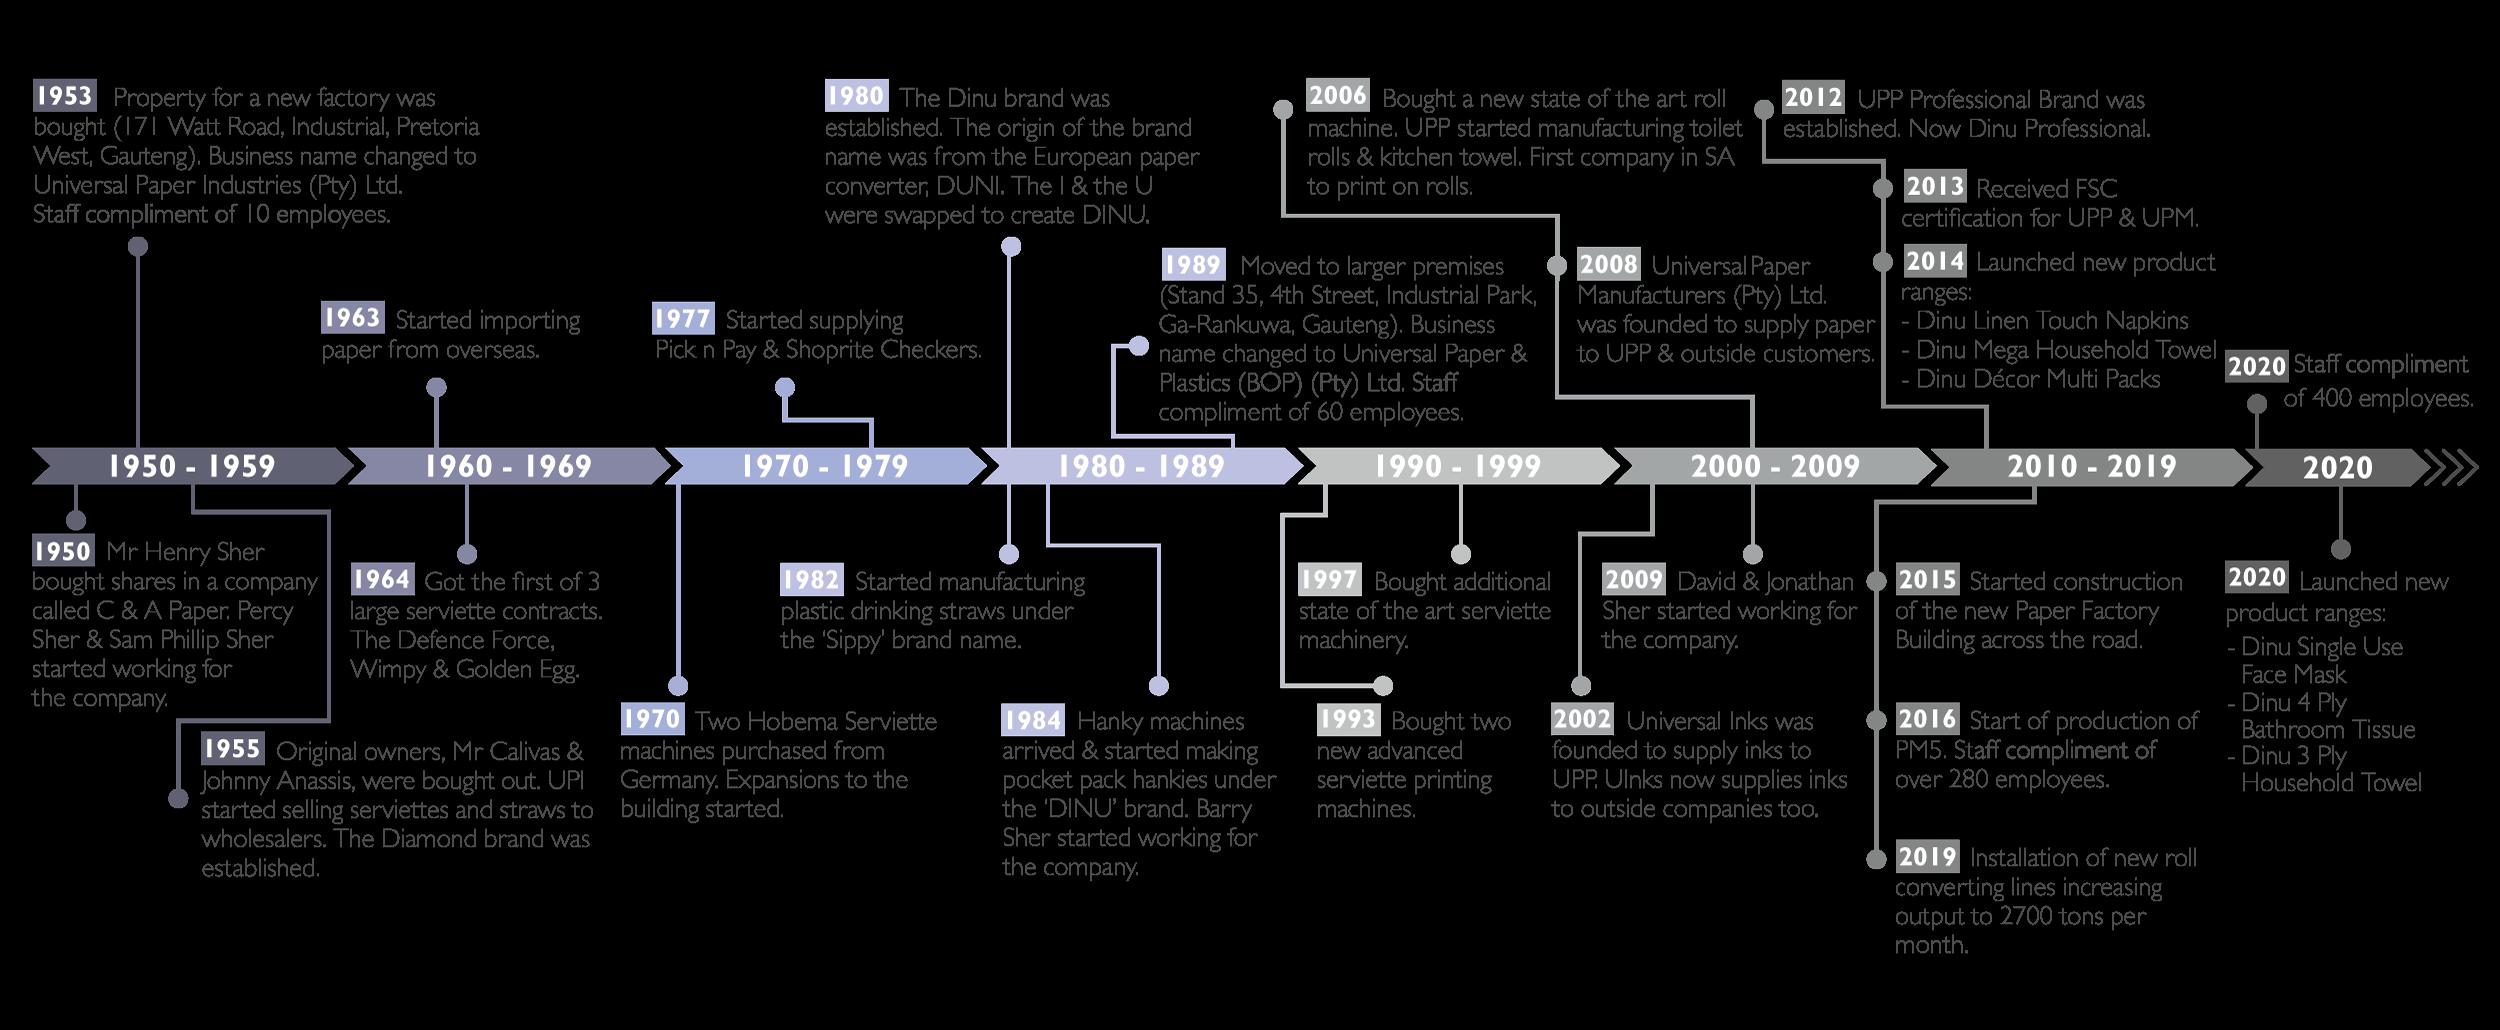 Universal Paper Company History 1950-2020